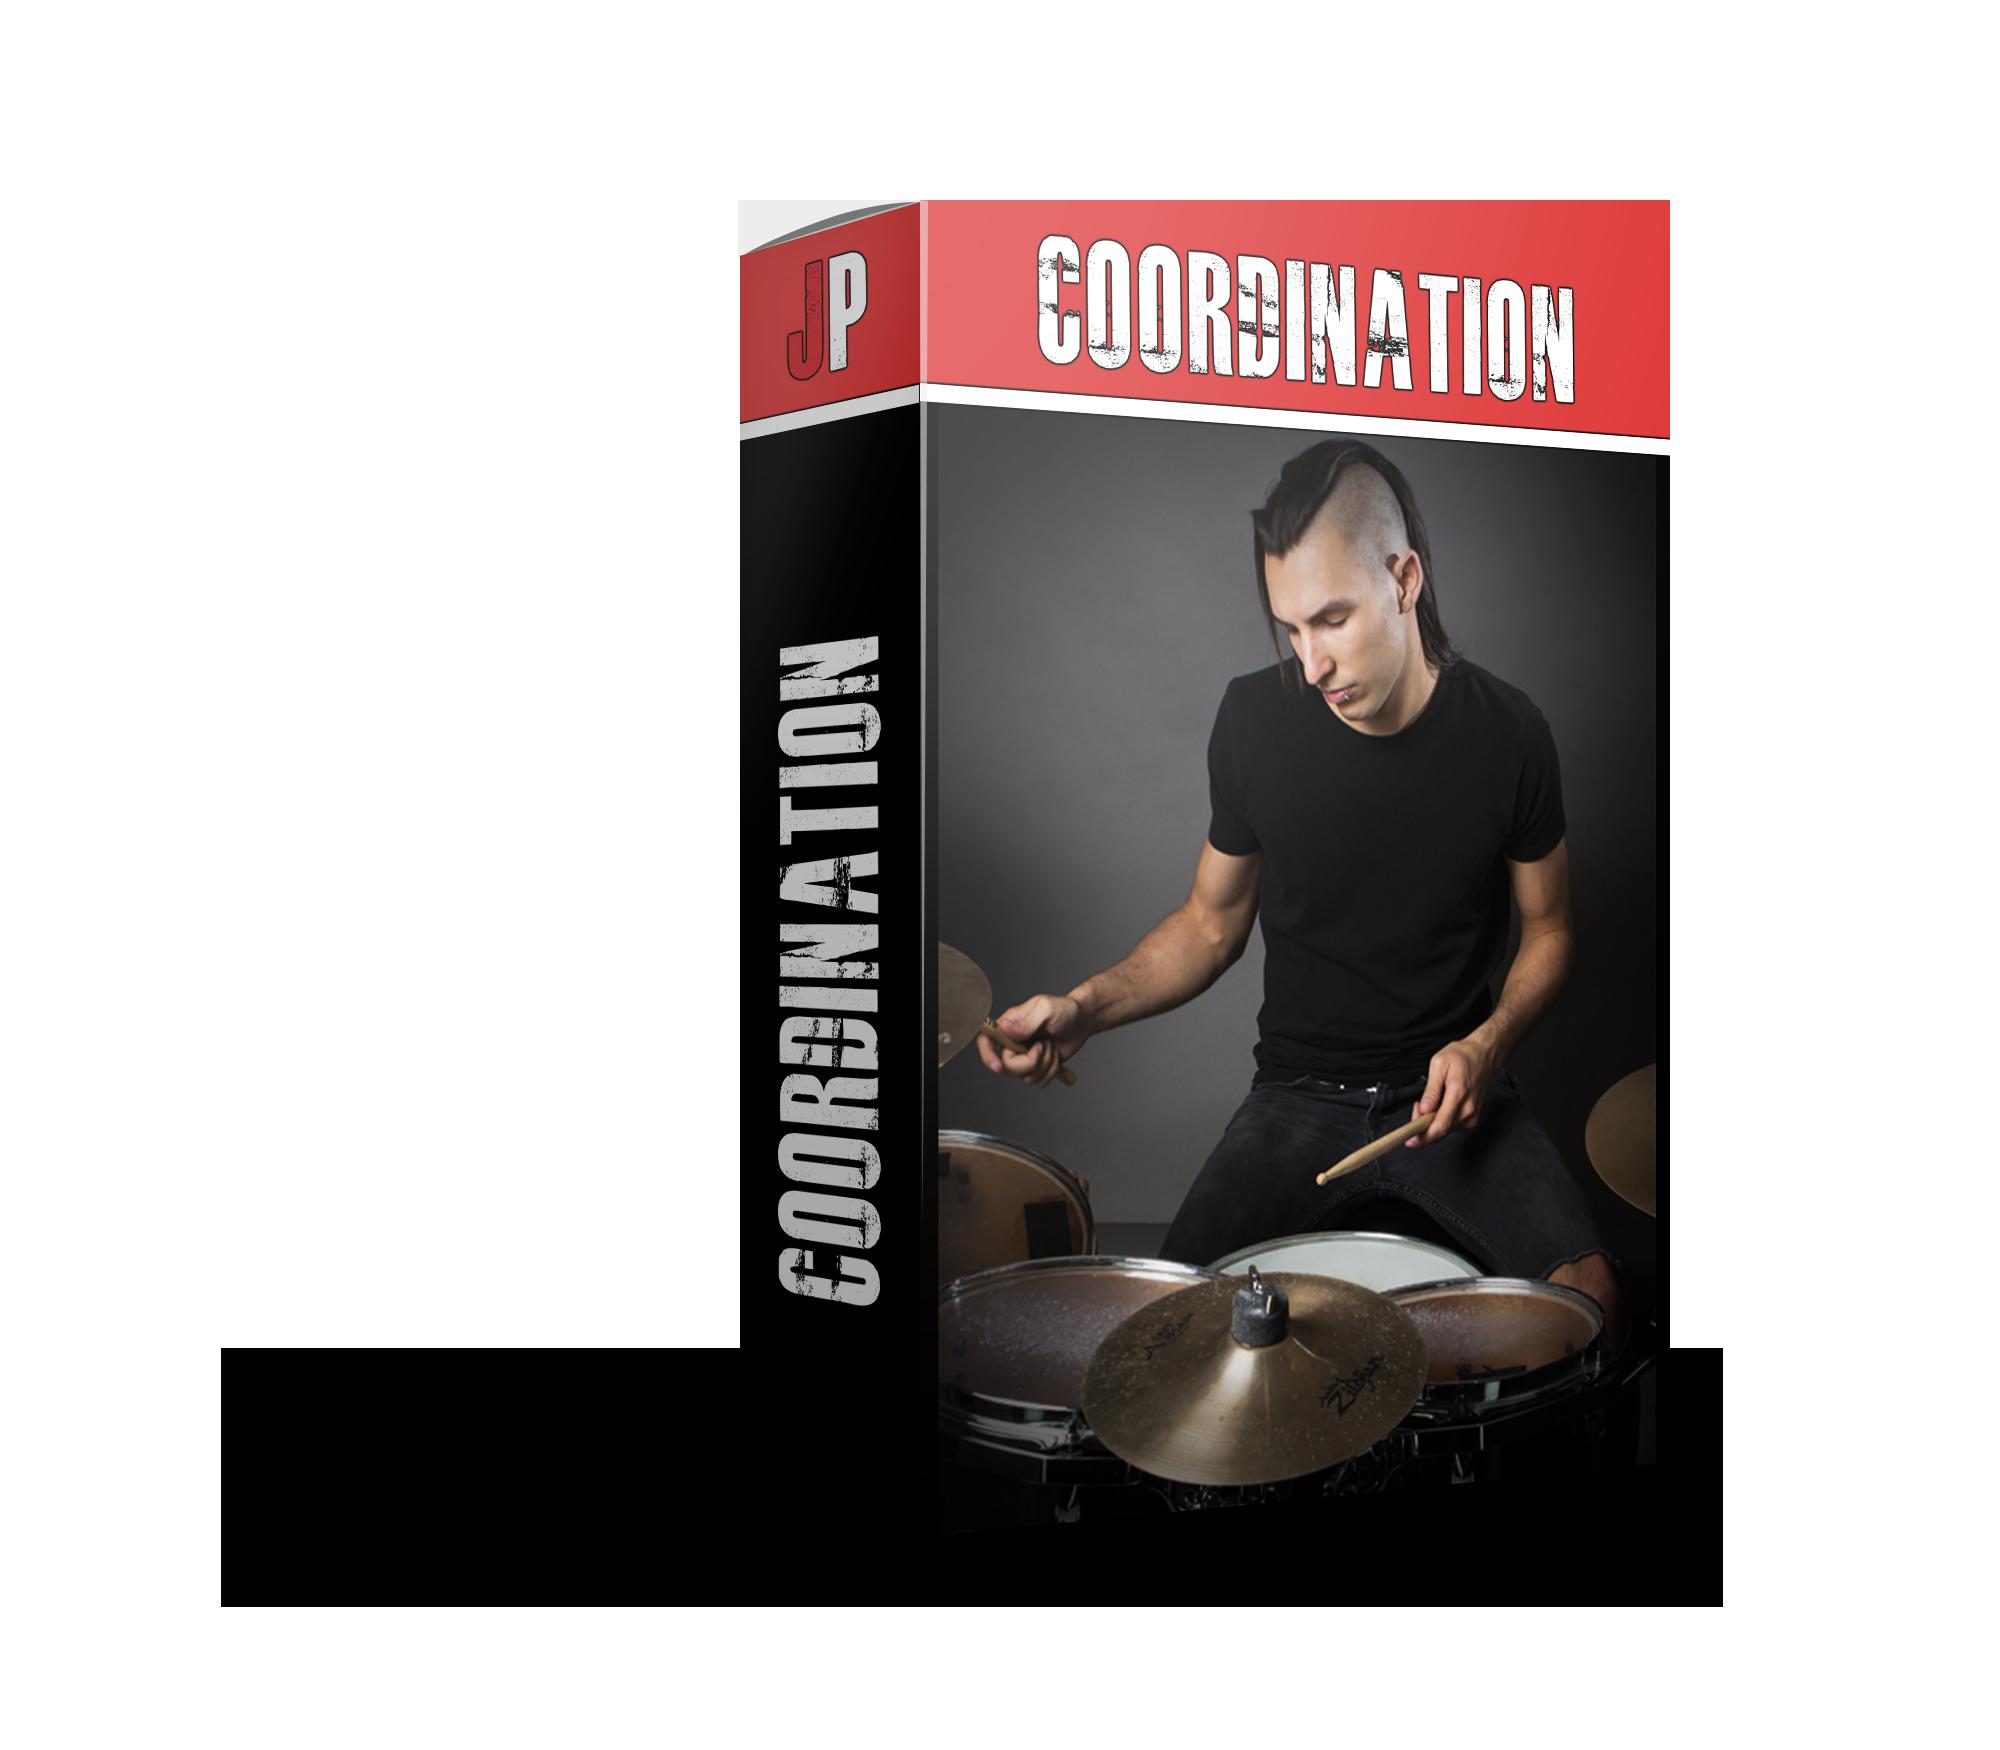 Coordination course image